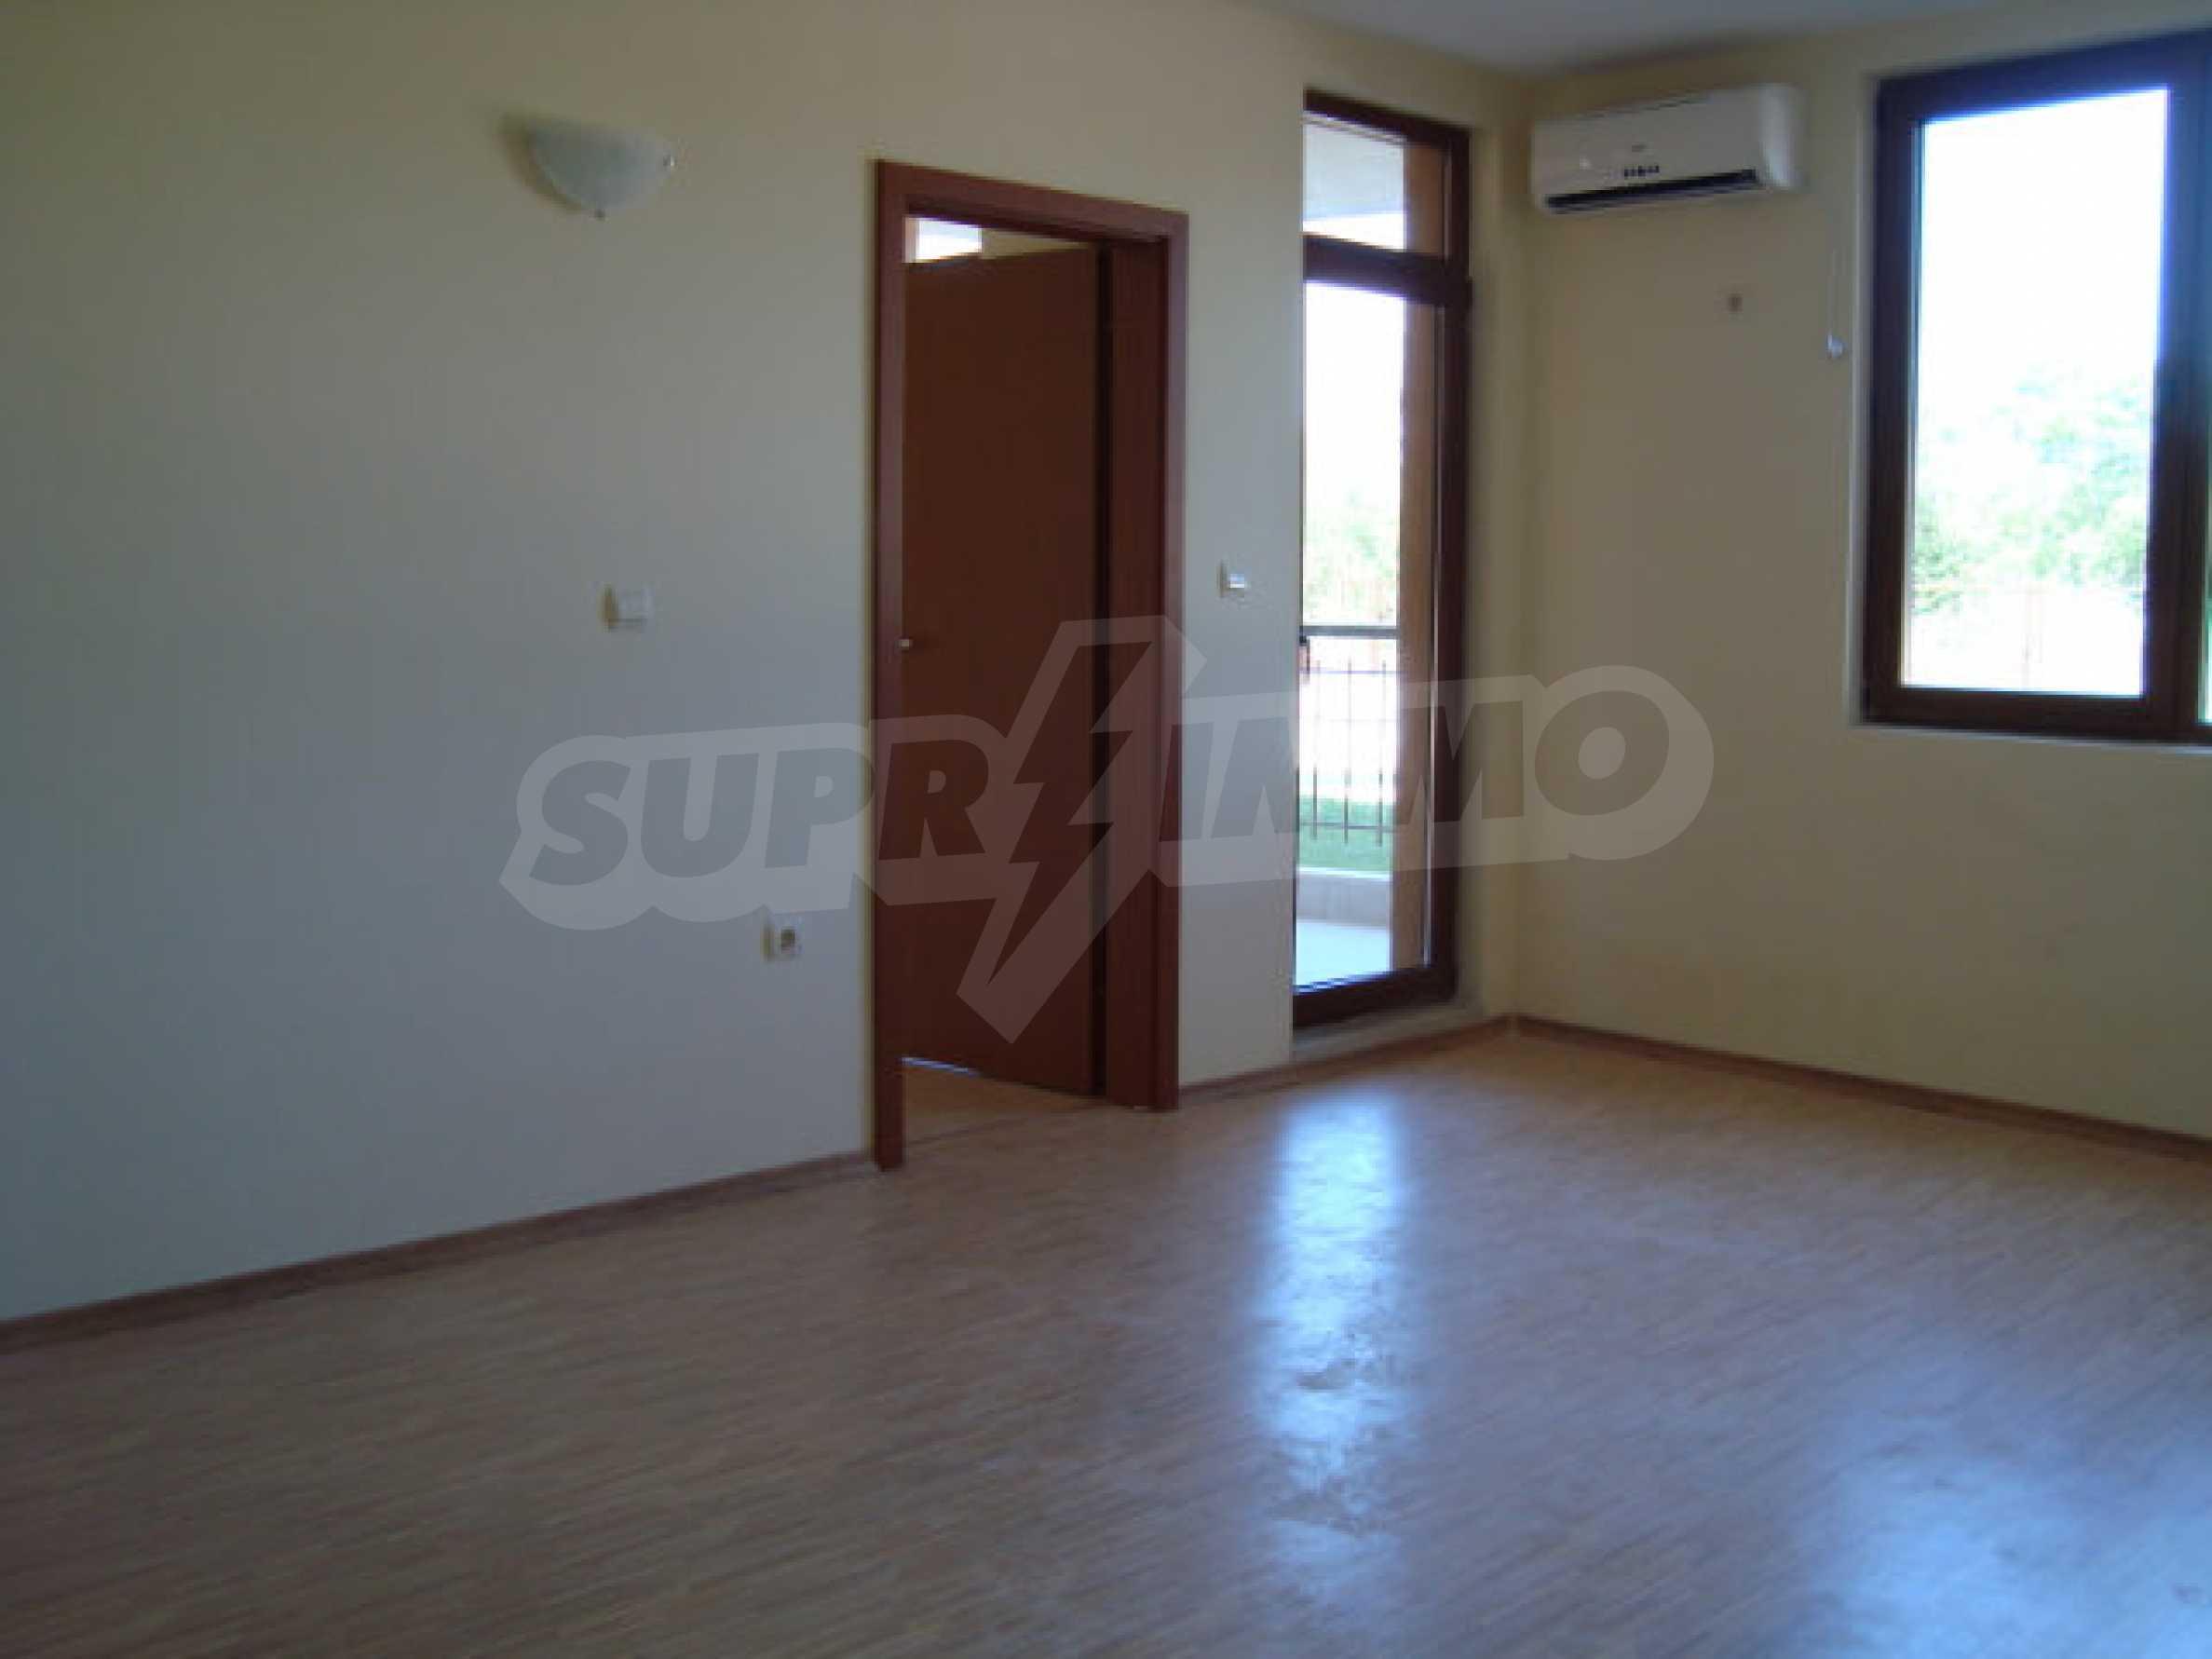 Studios und Apartments im Nestinarka-Komplex in Tsarevo 30